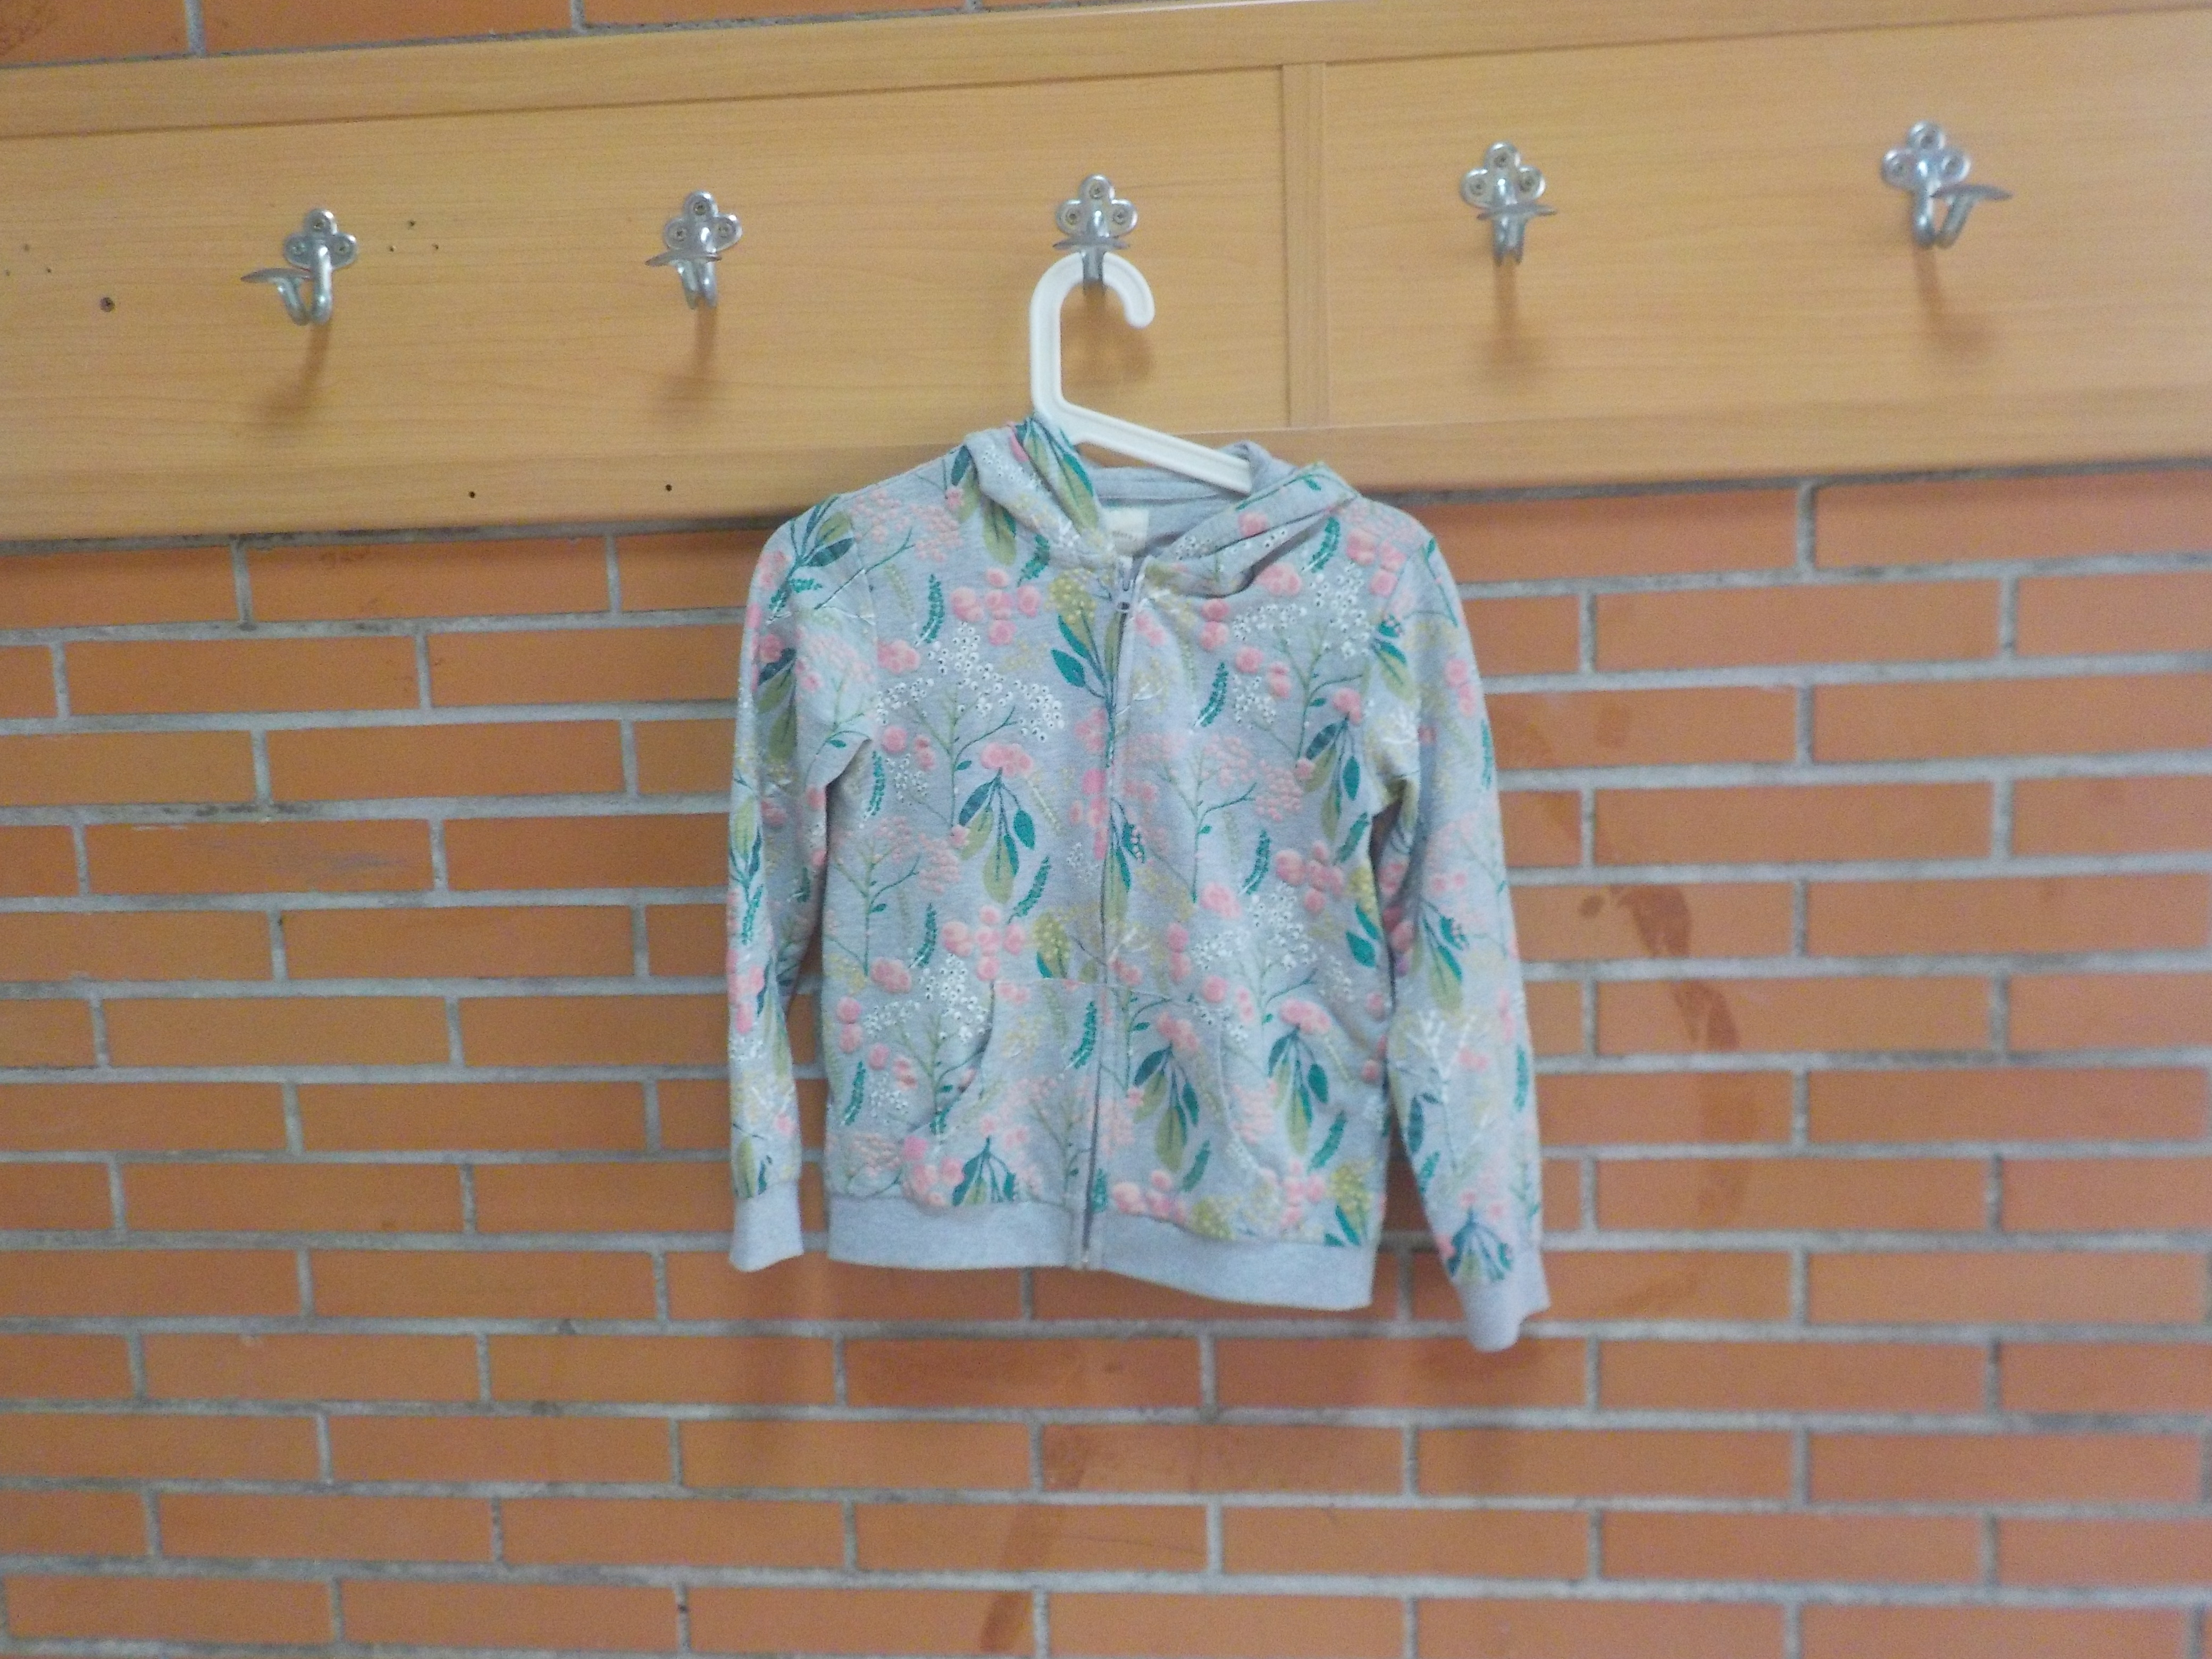 Catalogo de ropa olvidada 1  2018 10